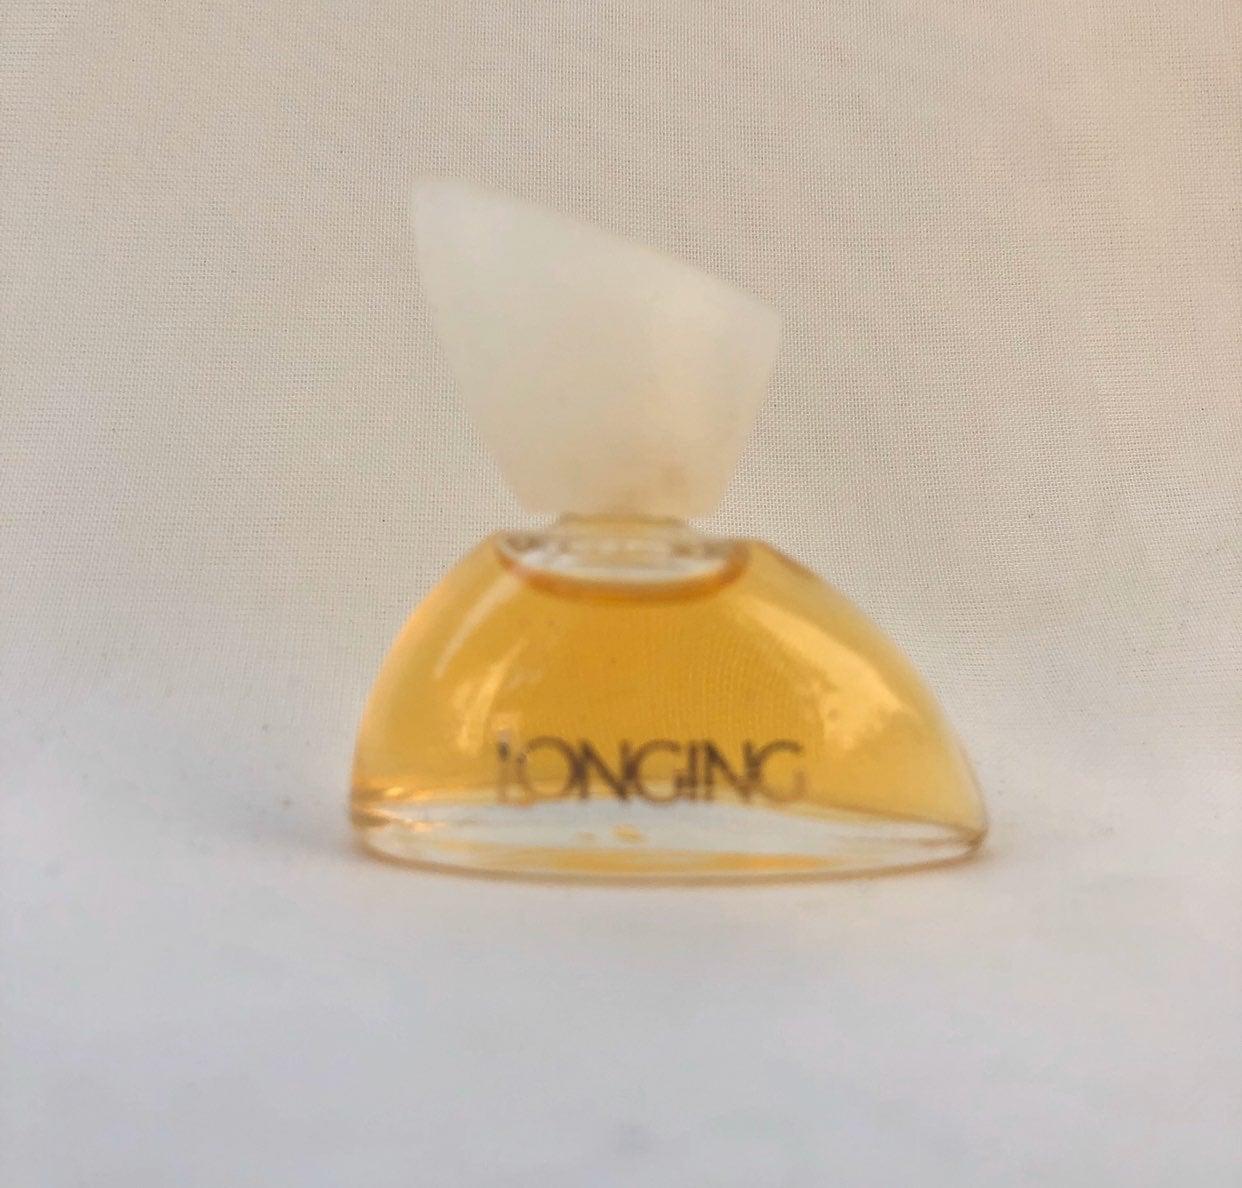 Vintage Longing Coty Mini Perfume